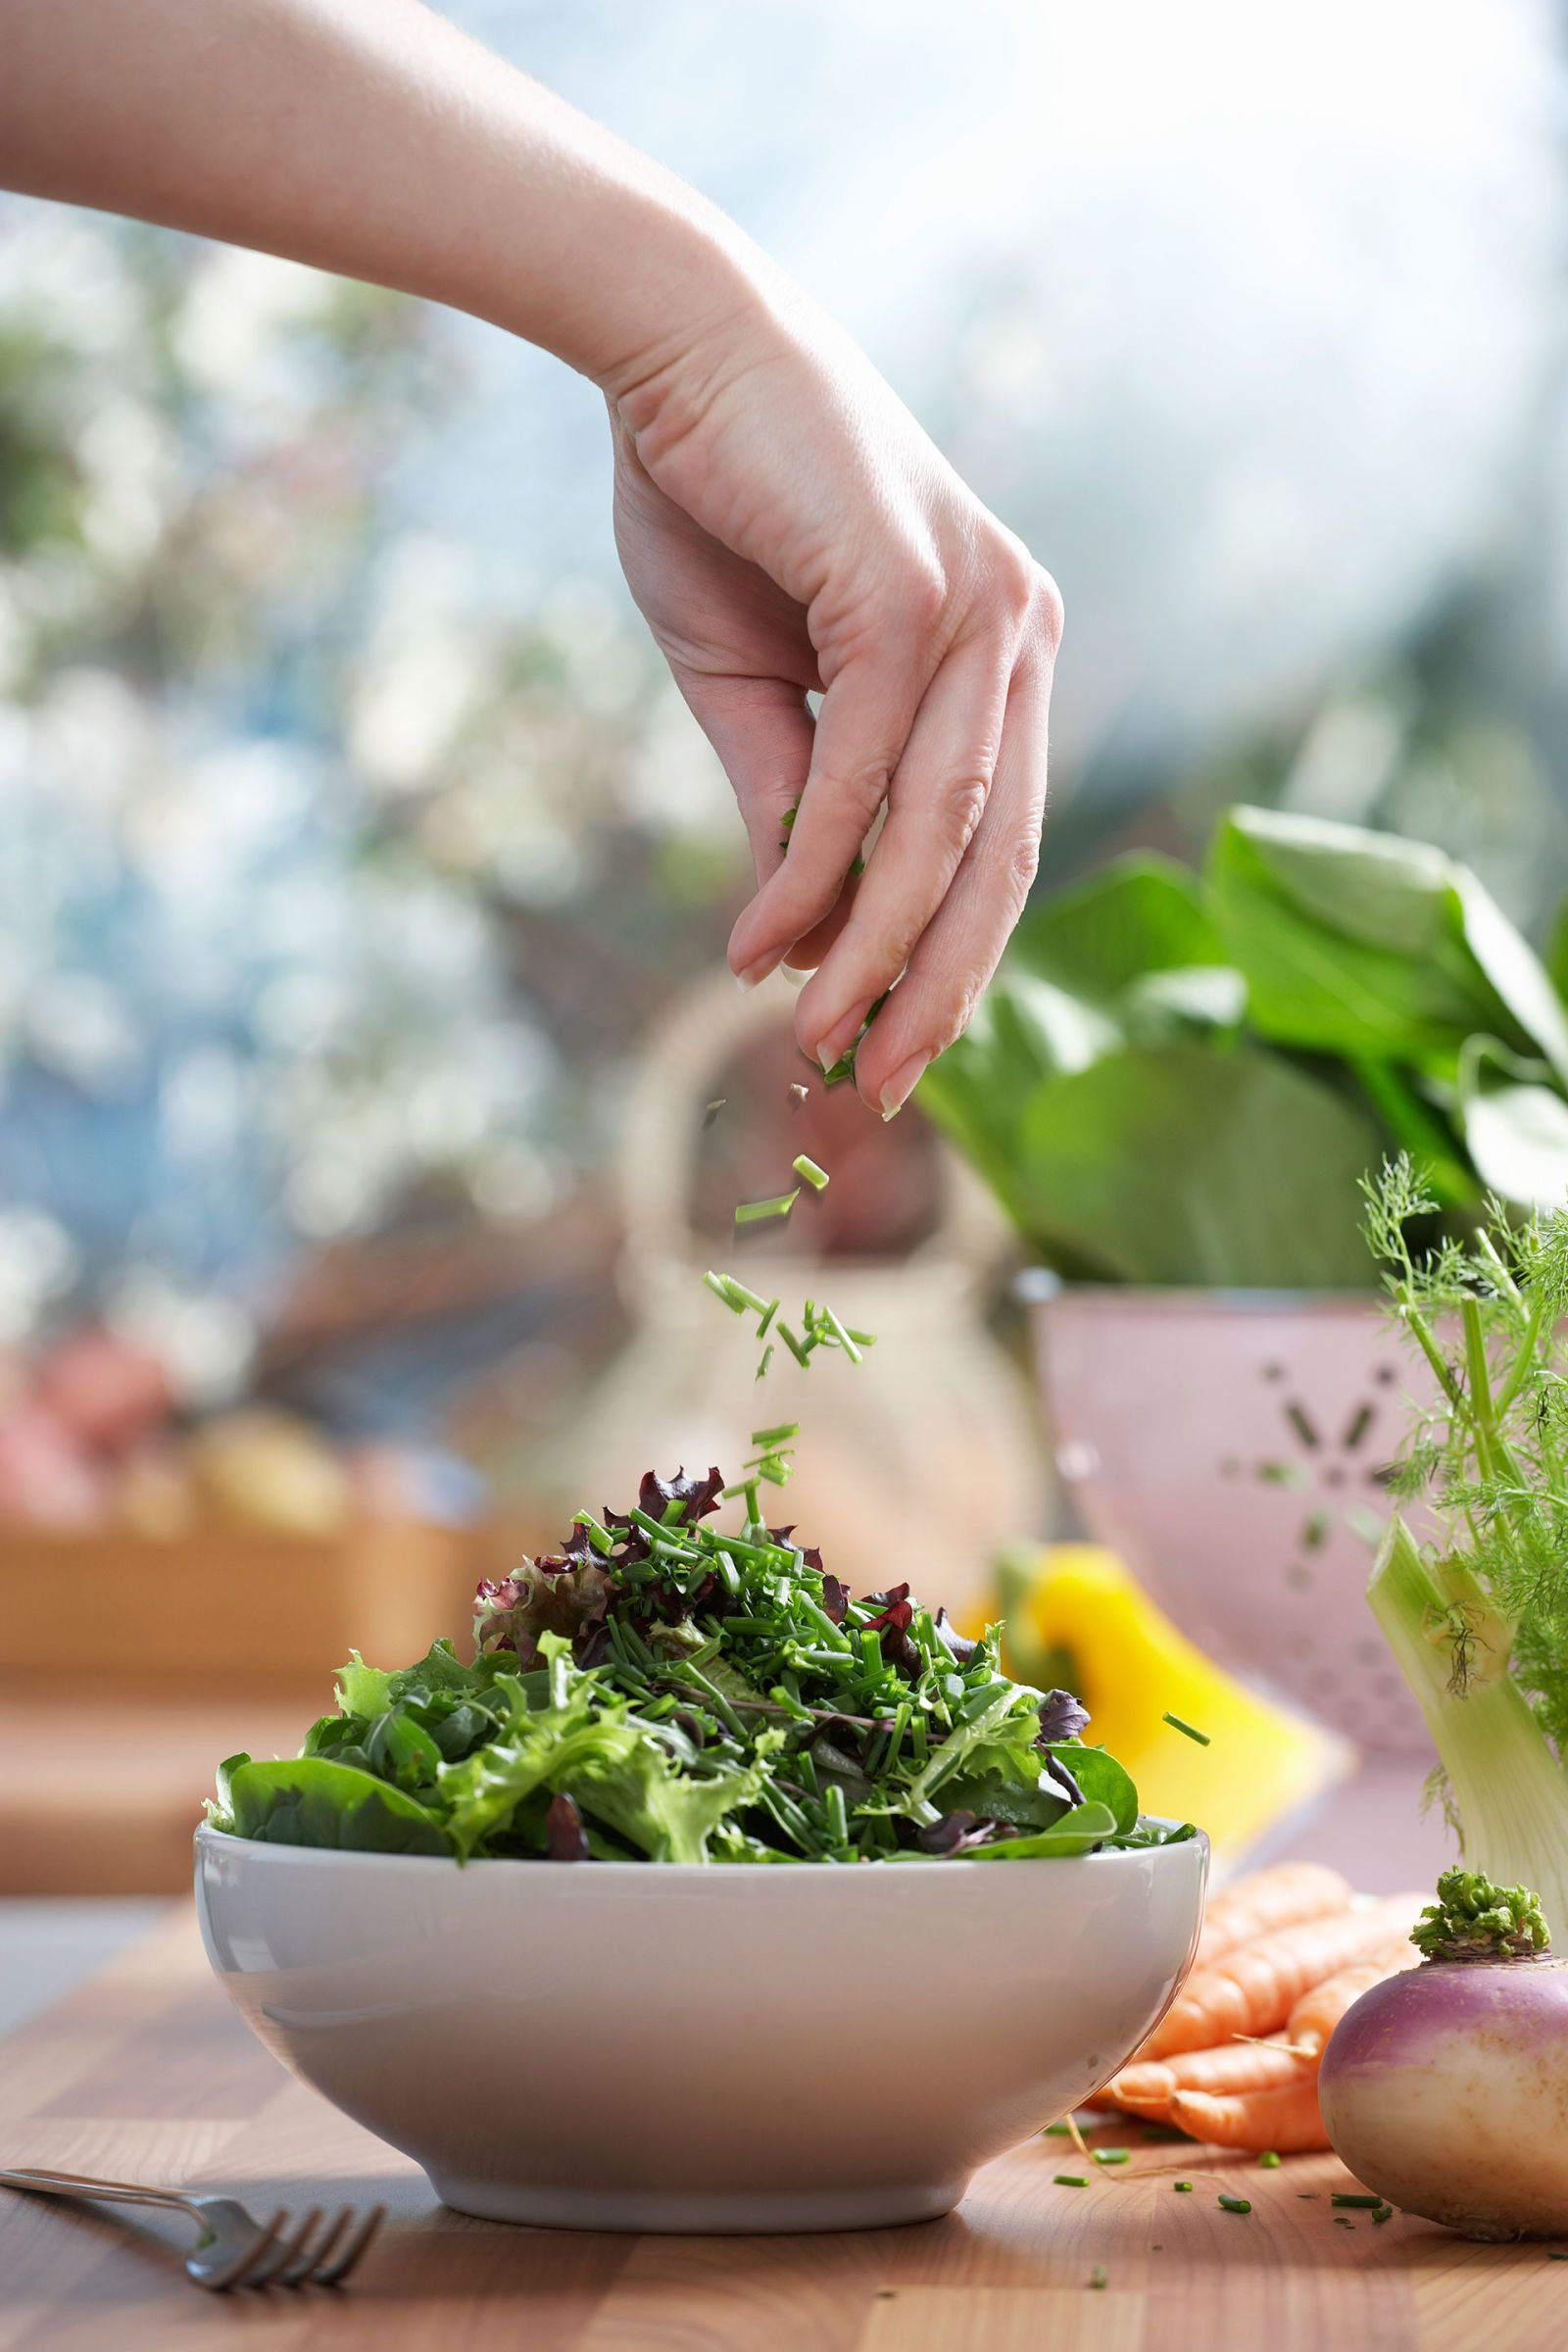 woman sprinkling her salad